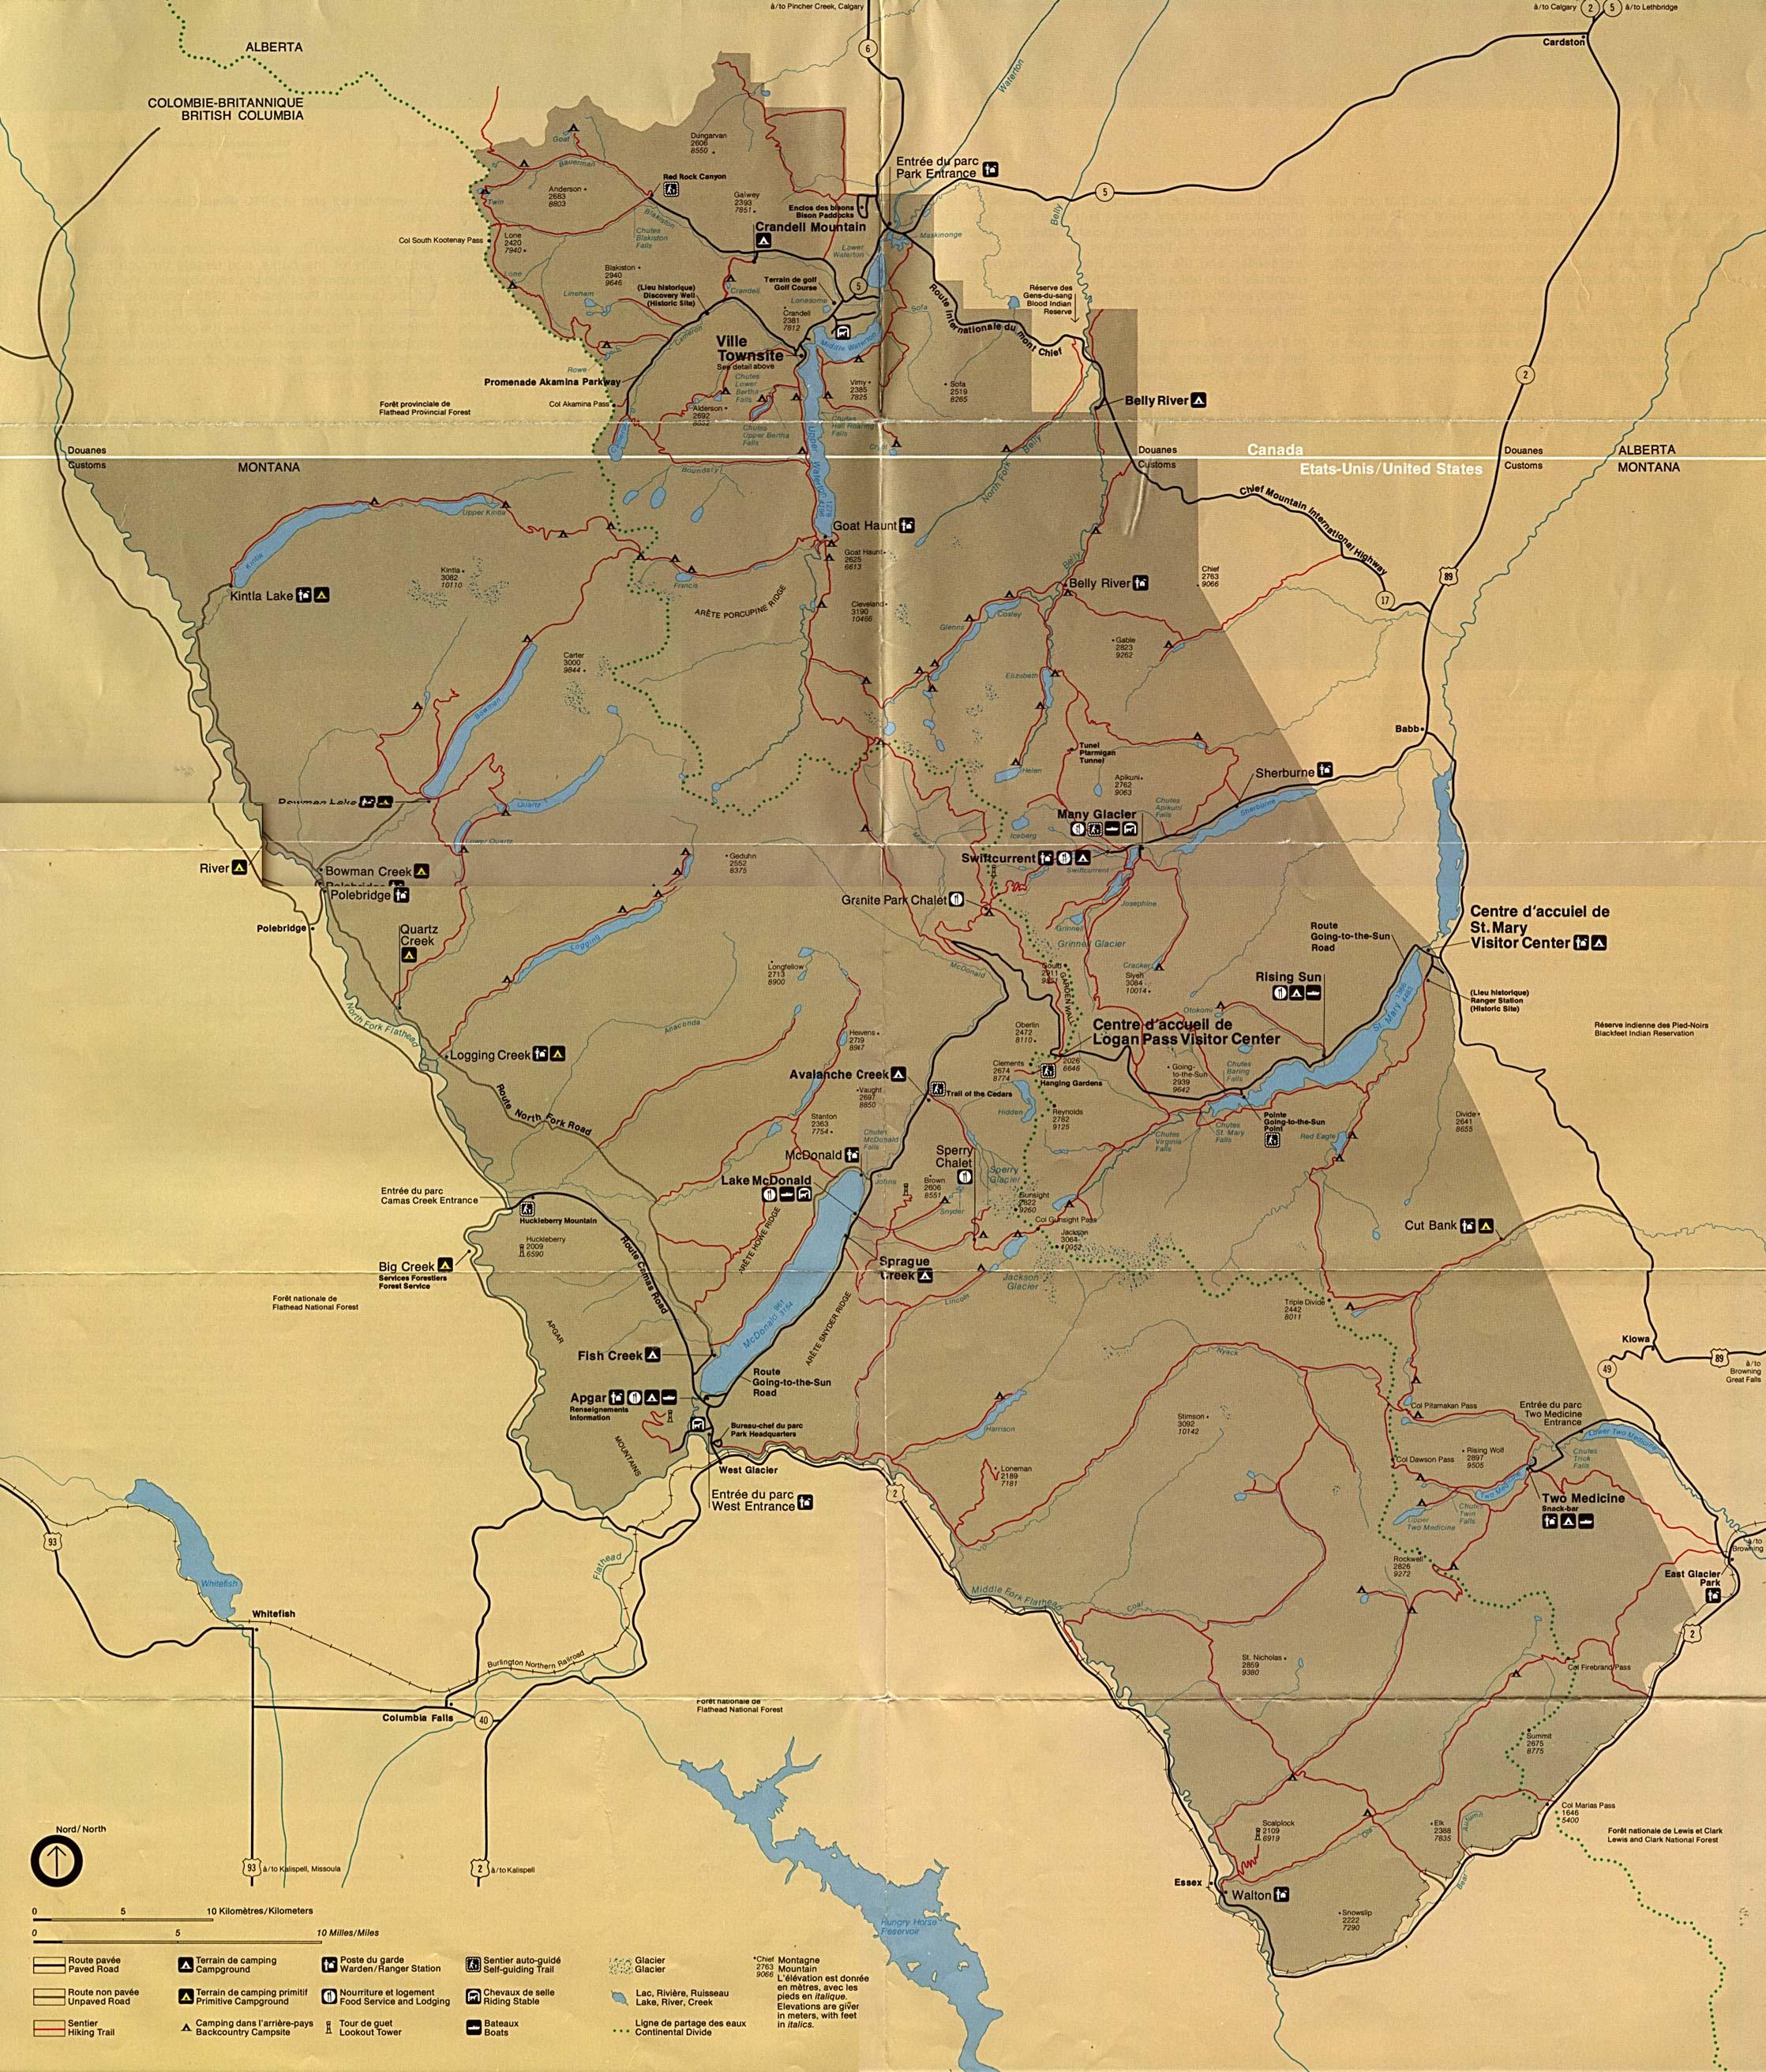 1Up Travel - Maps of United States (U.S) National Parks ...